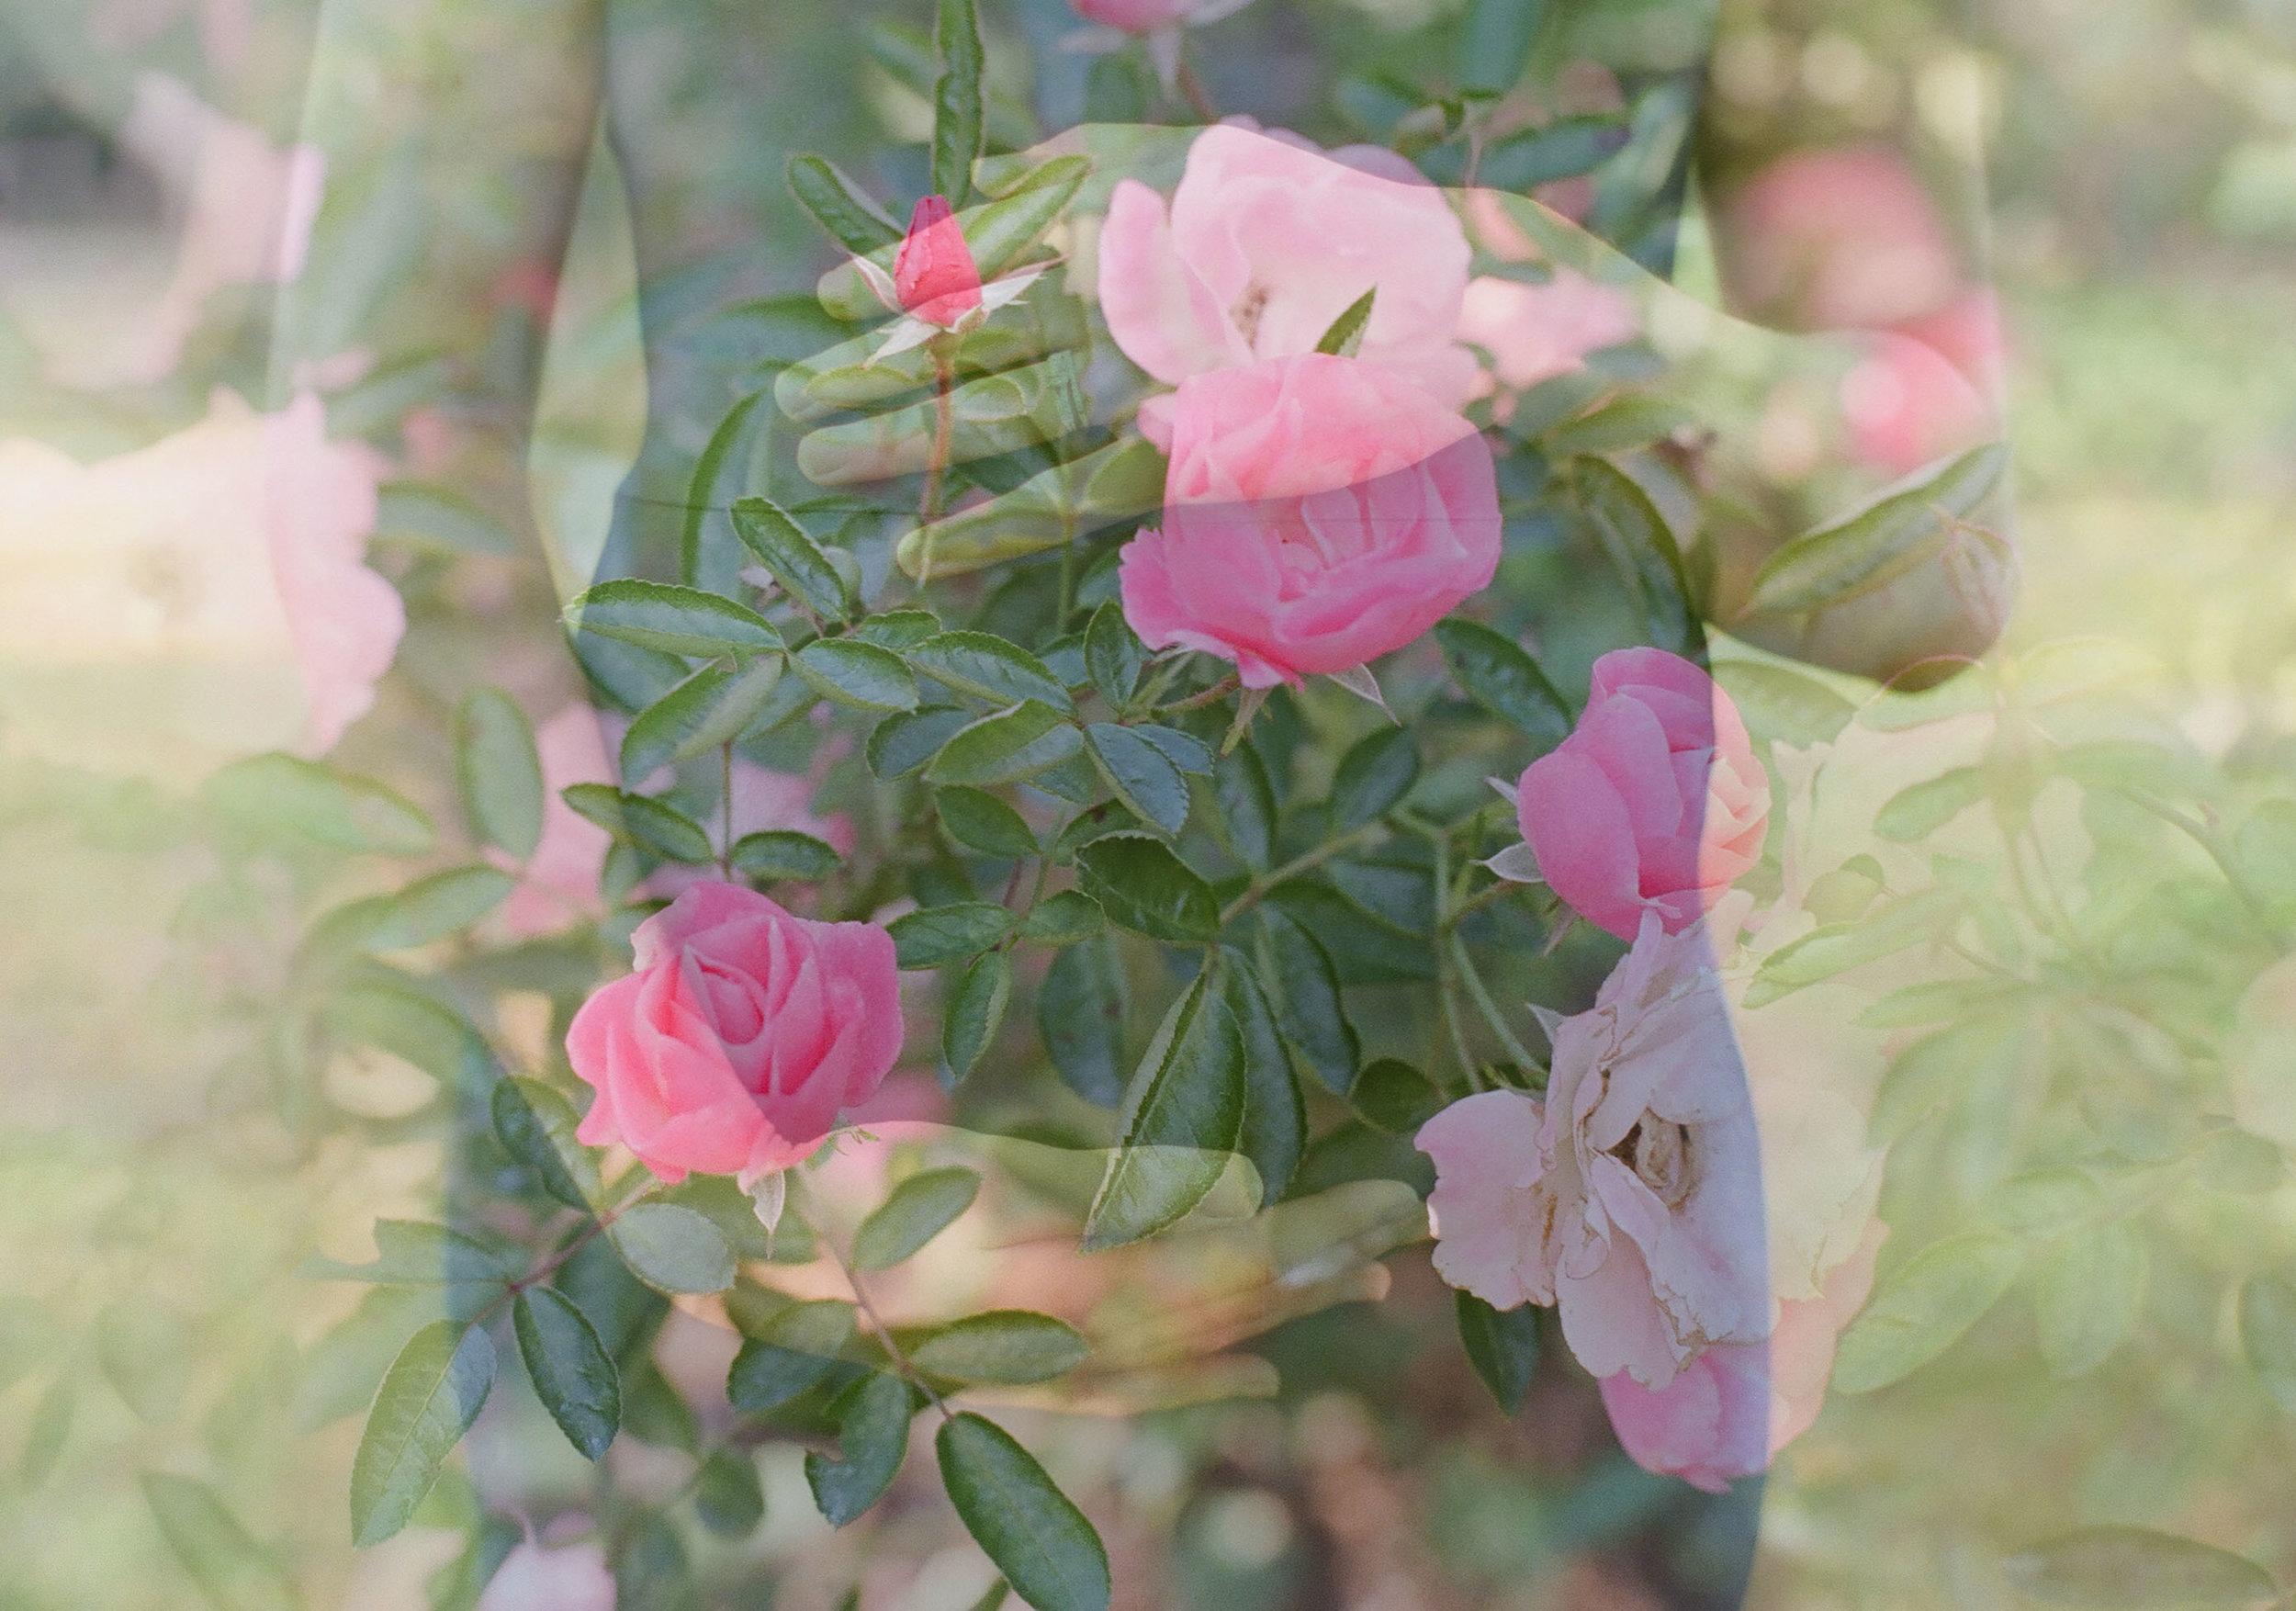 sauphia-germain-photo-double-exposure.jpg